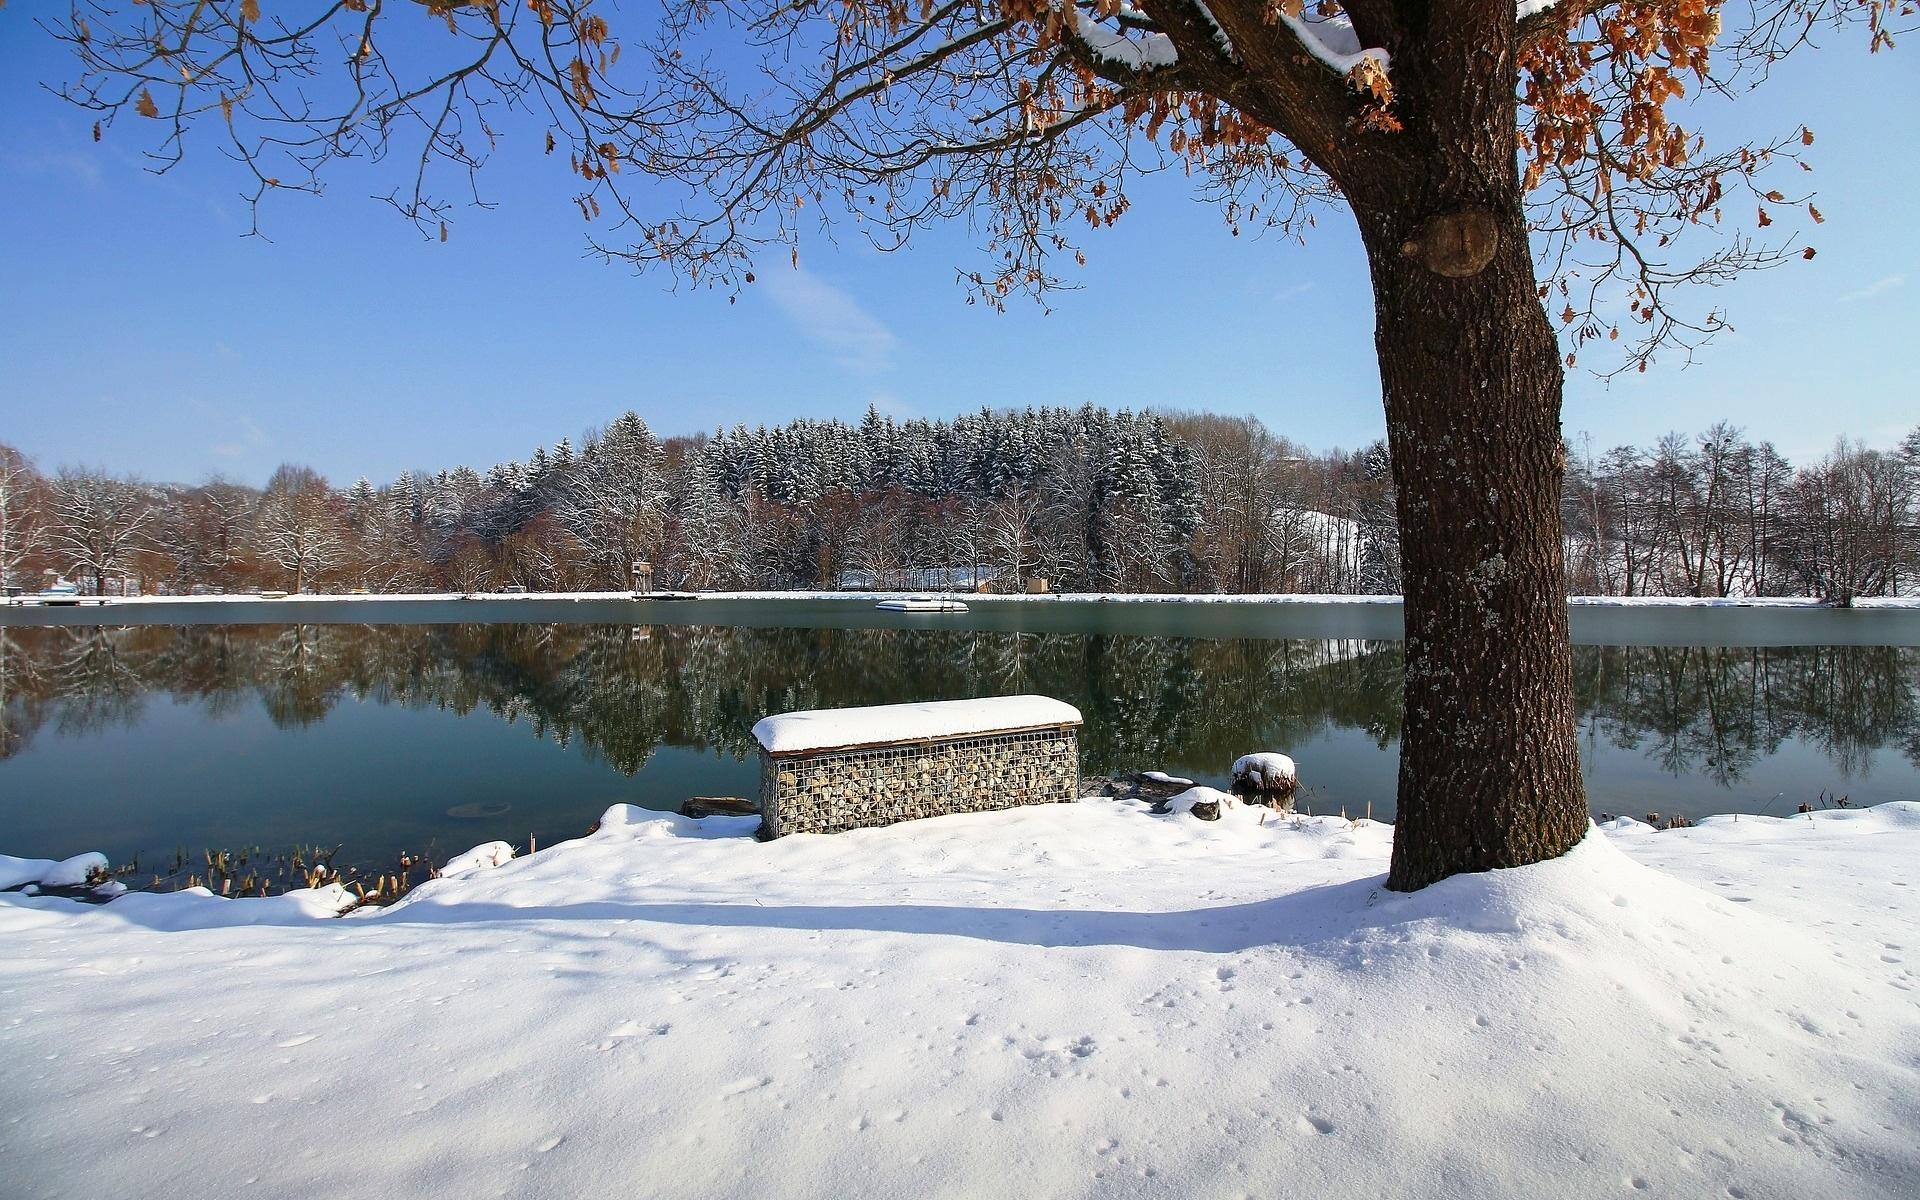 снег, река, деревья